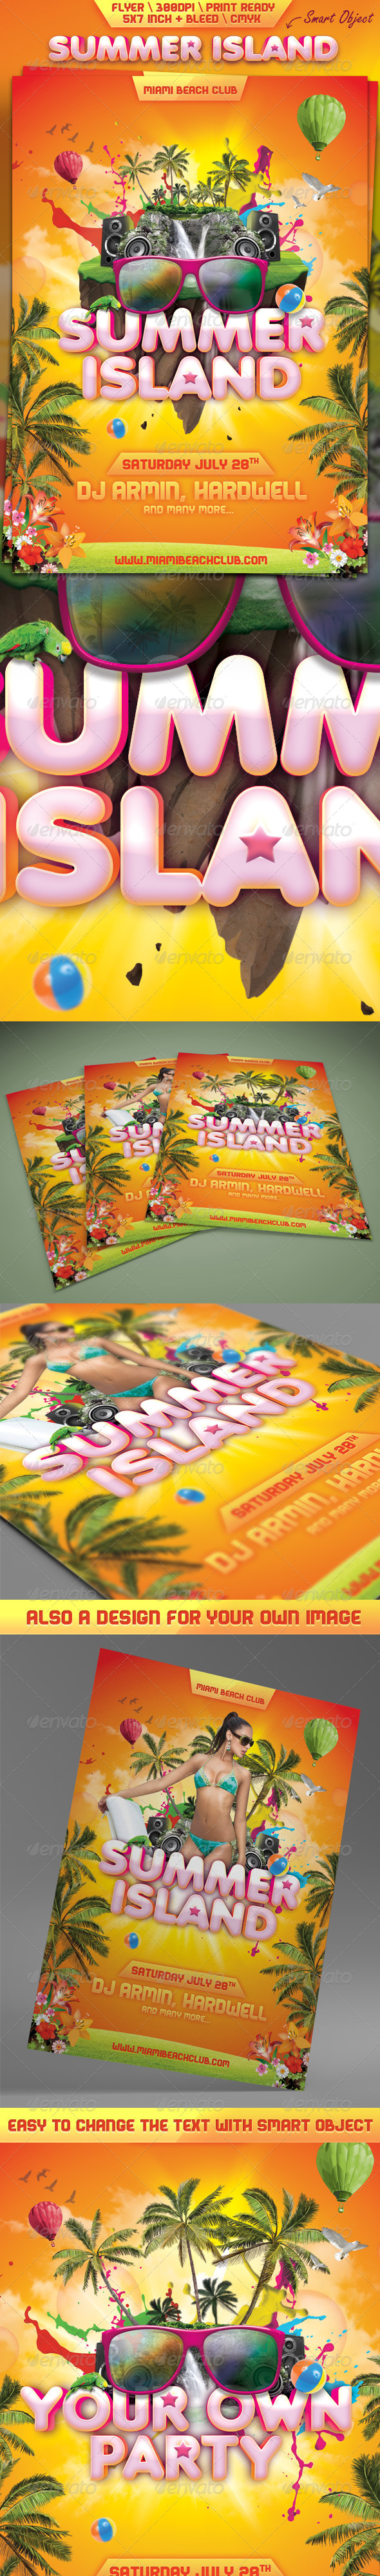 Summer Island Flyer